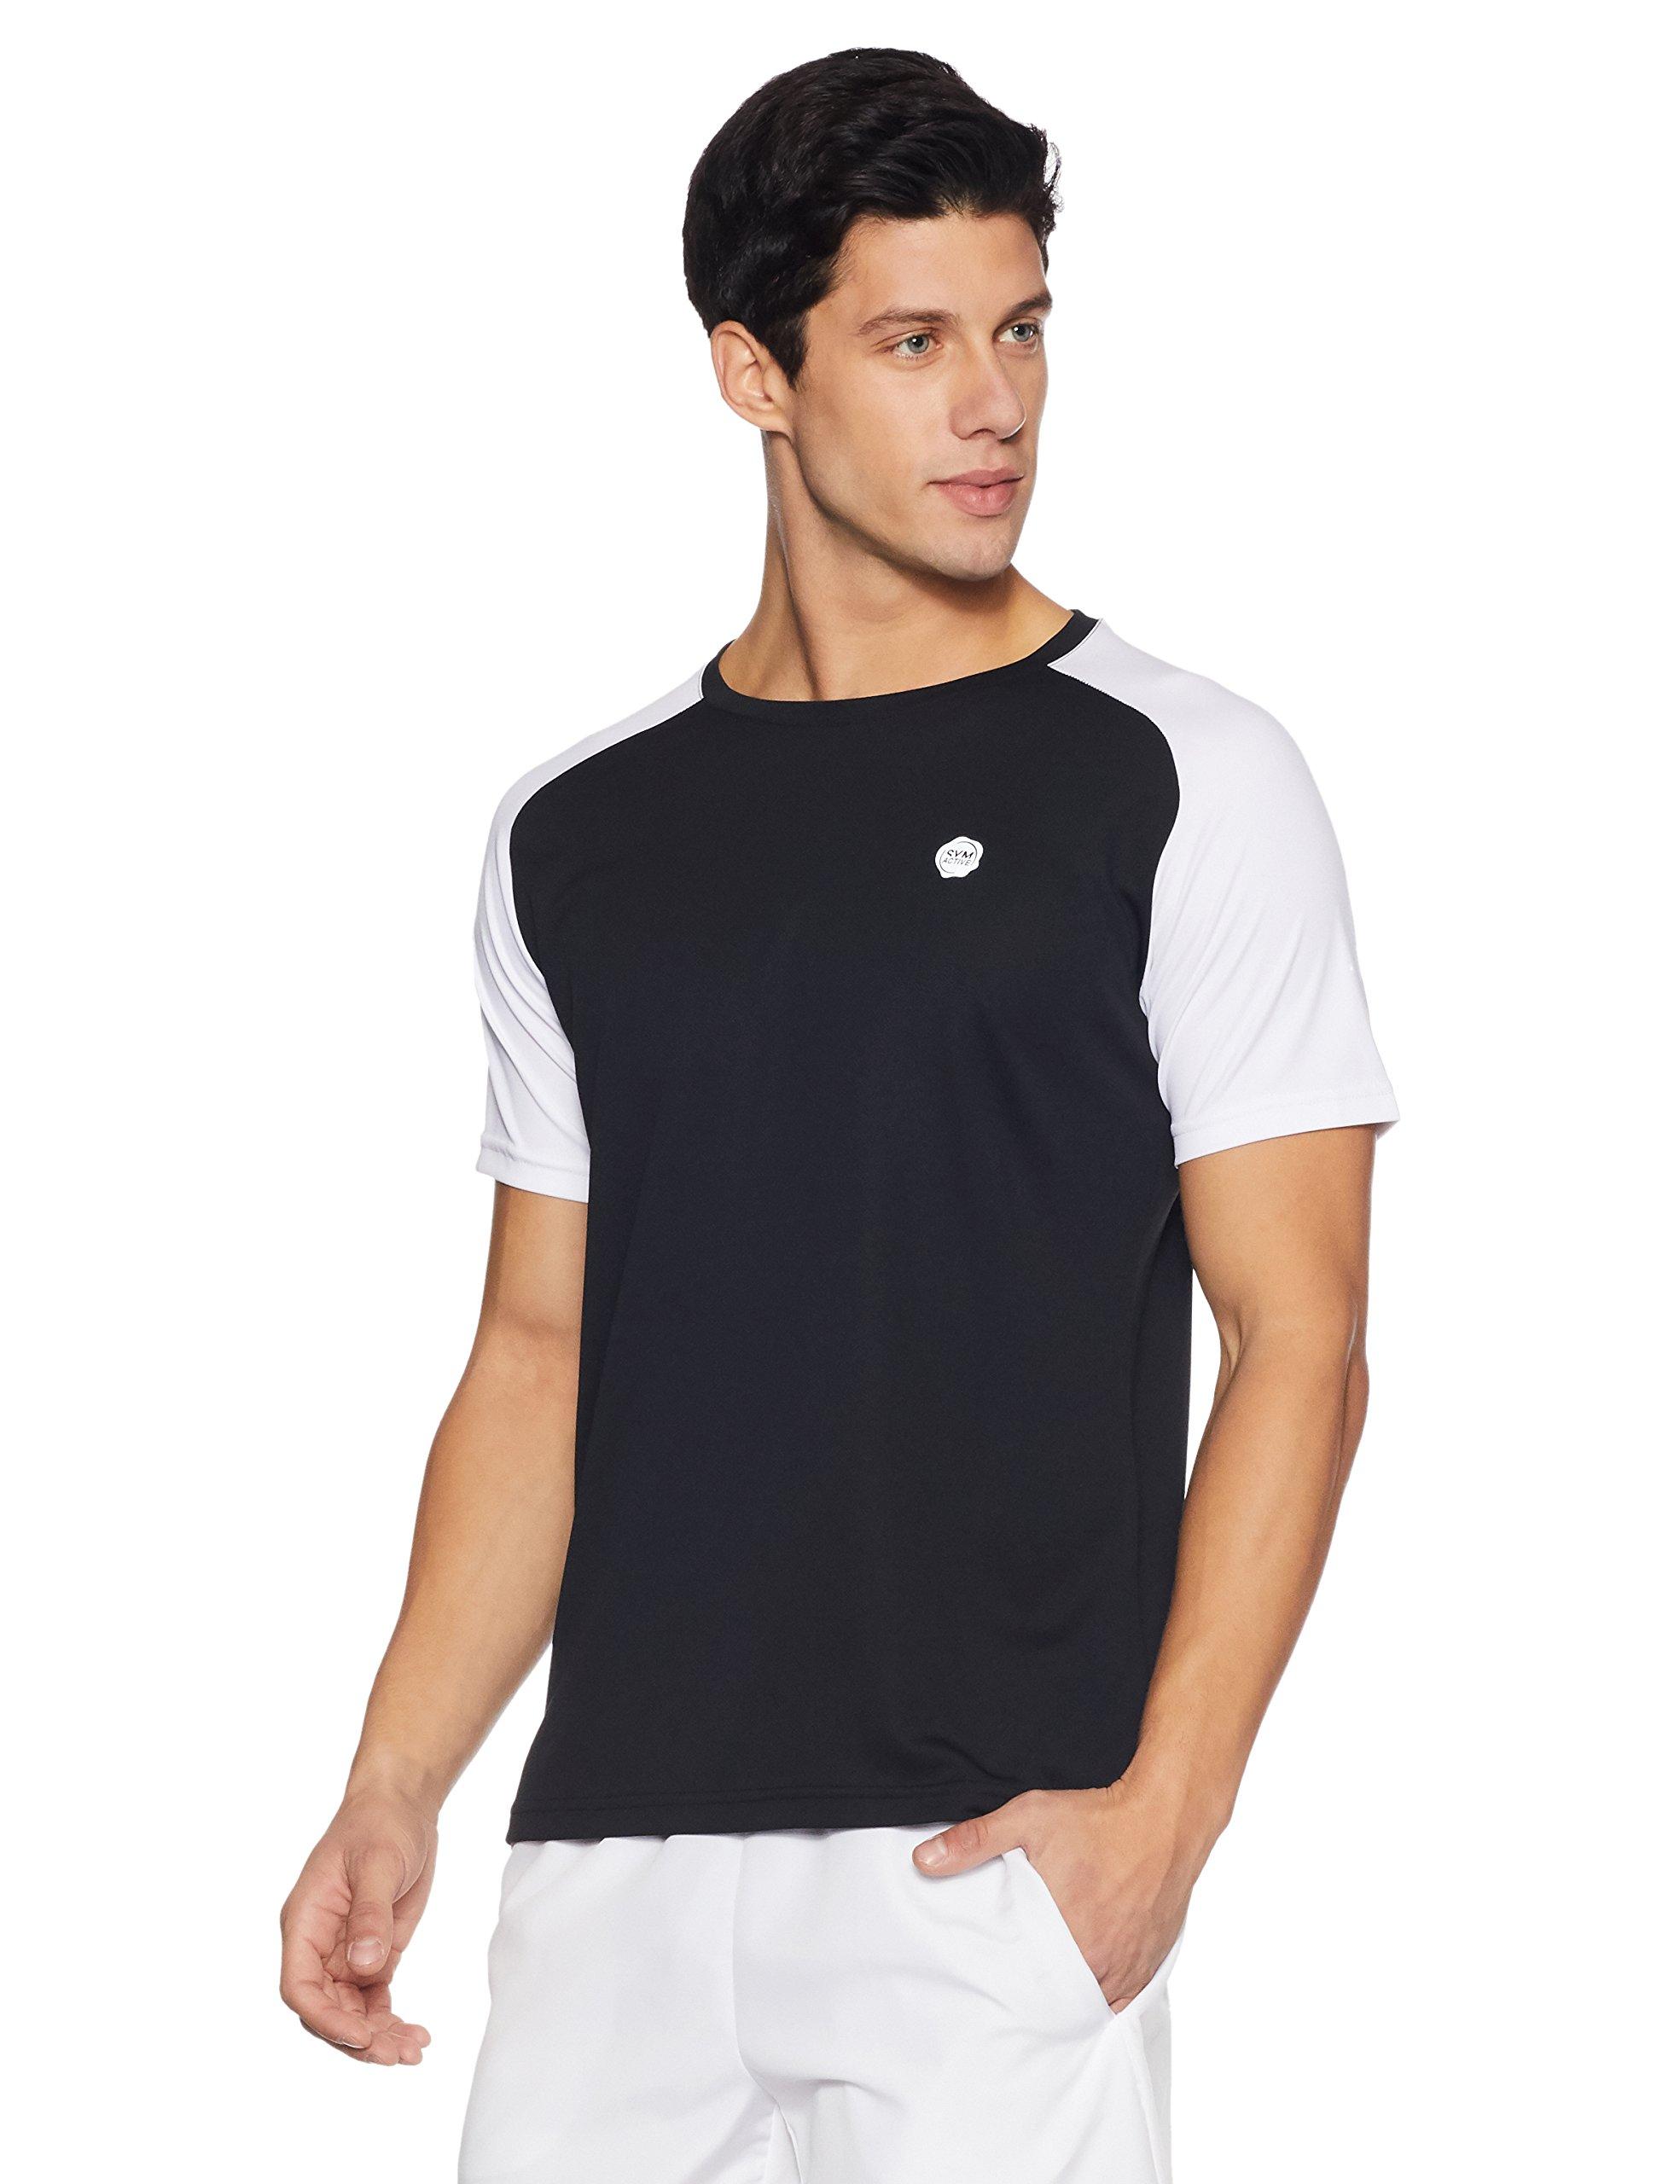 Amazon Brand - Symbol Men's Round Neck T-Shirt (AW17-SYSP-02B_Small_Black) (B072N81FKL) Amazon Price History, Amazon Price Tracker